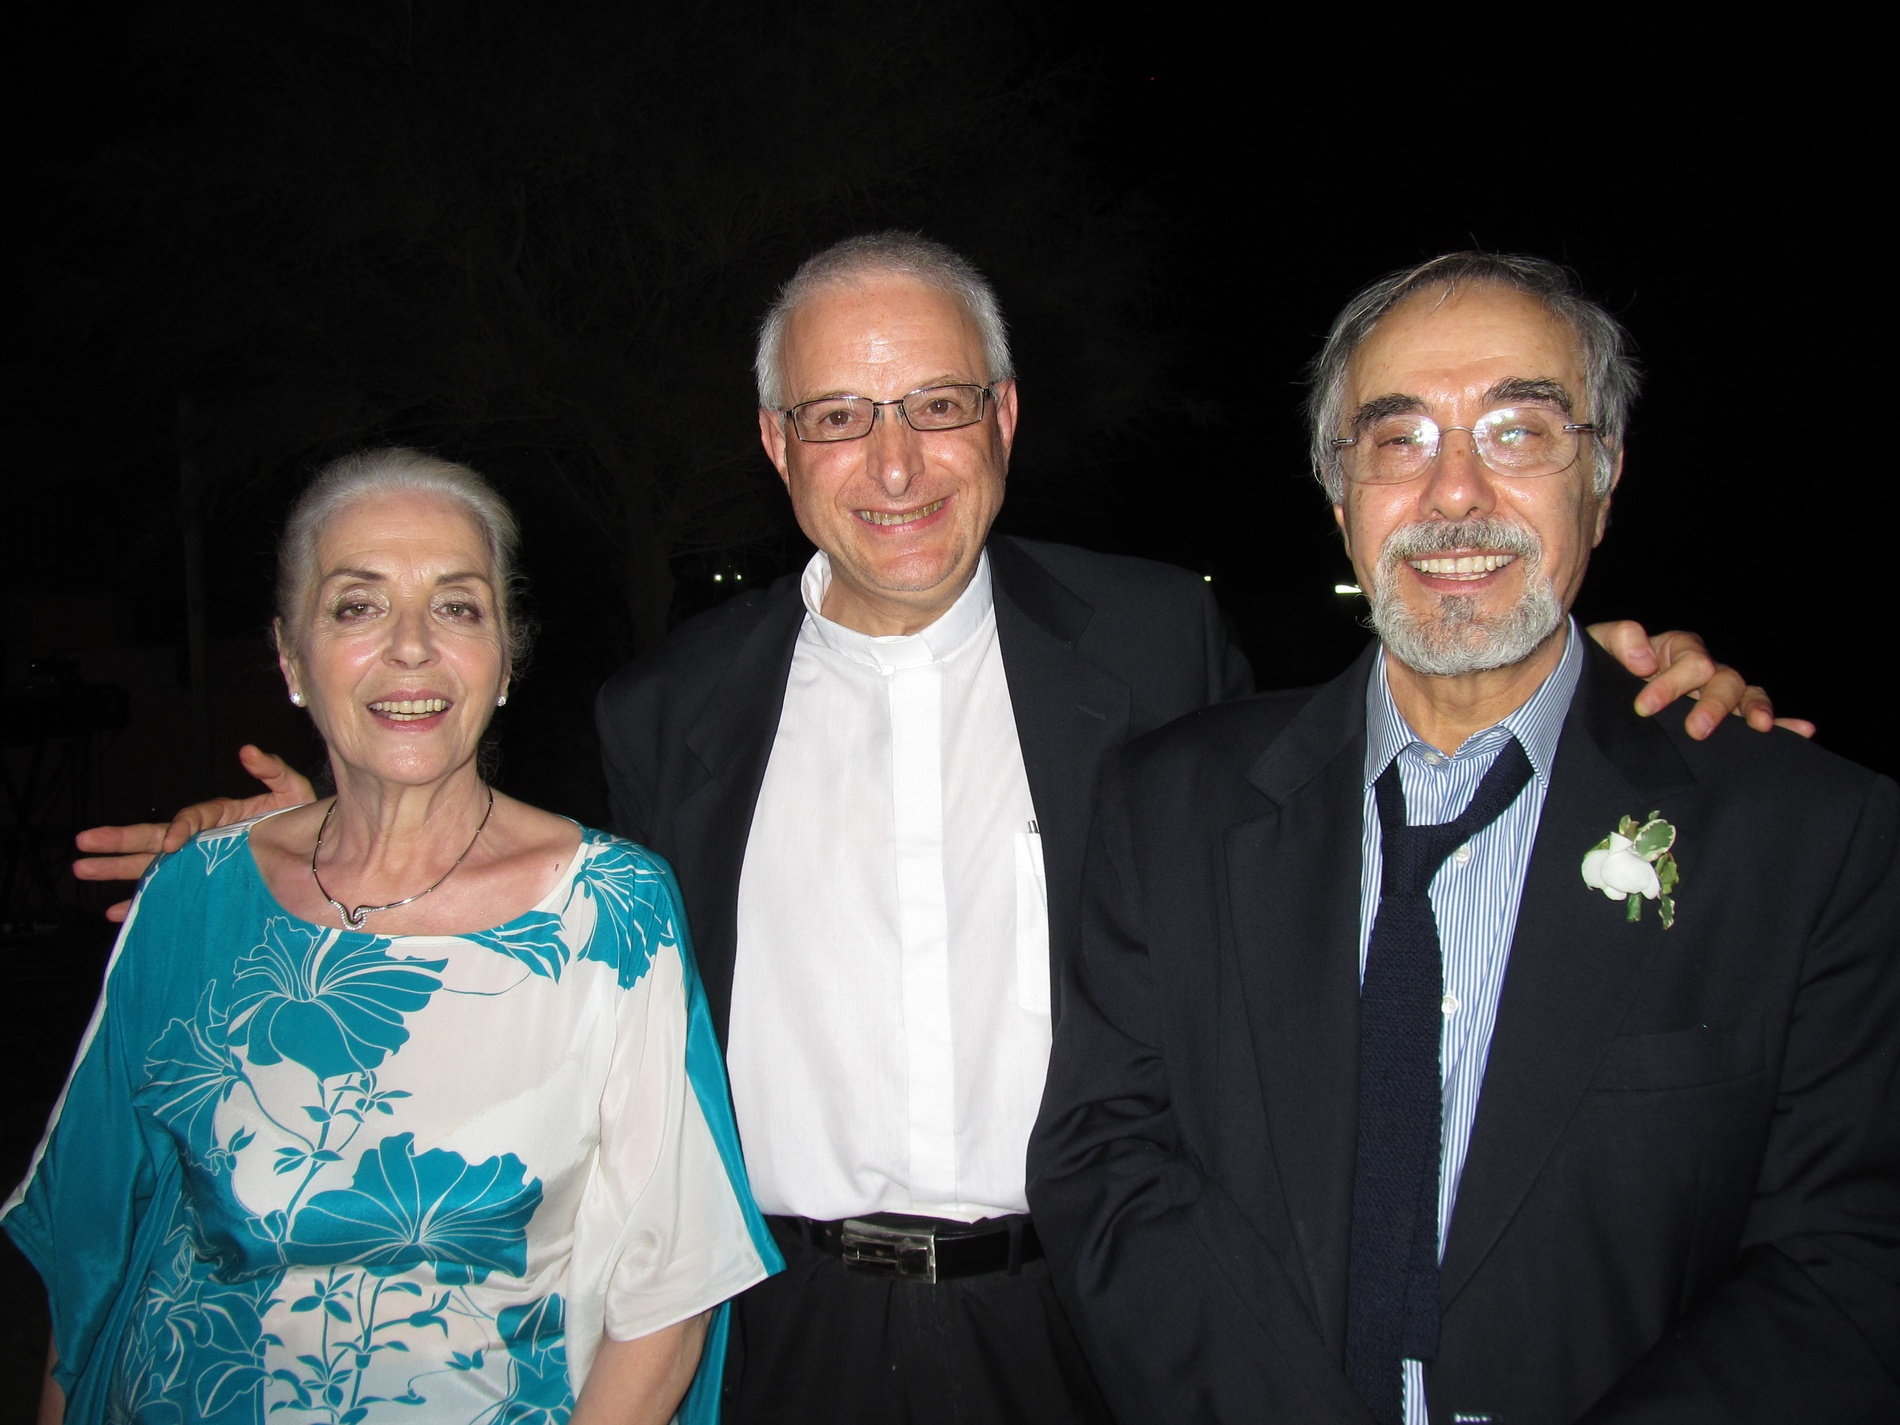 matrimonio-ilaria-torrisi-e-marco-di-lucia-2015-08-08-21-11-02